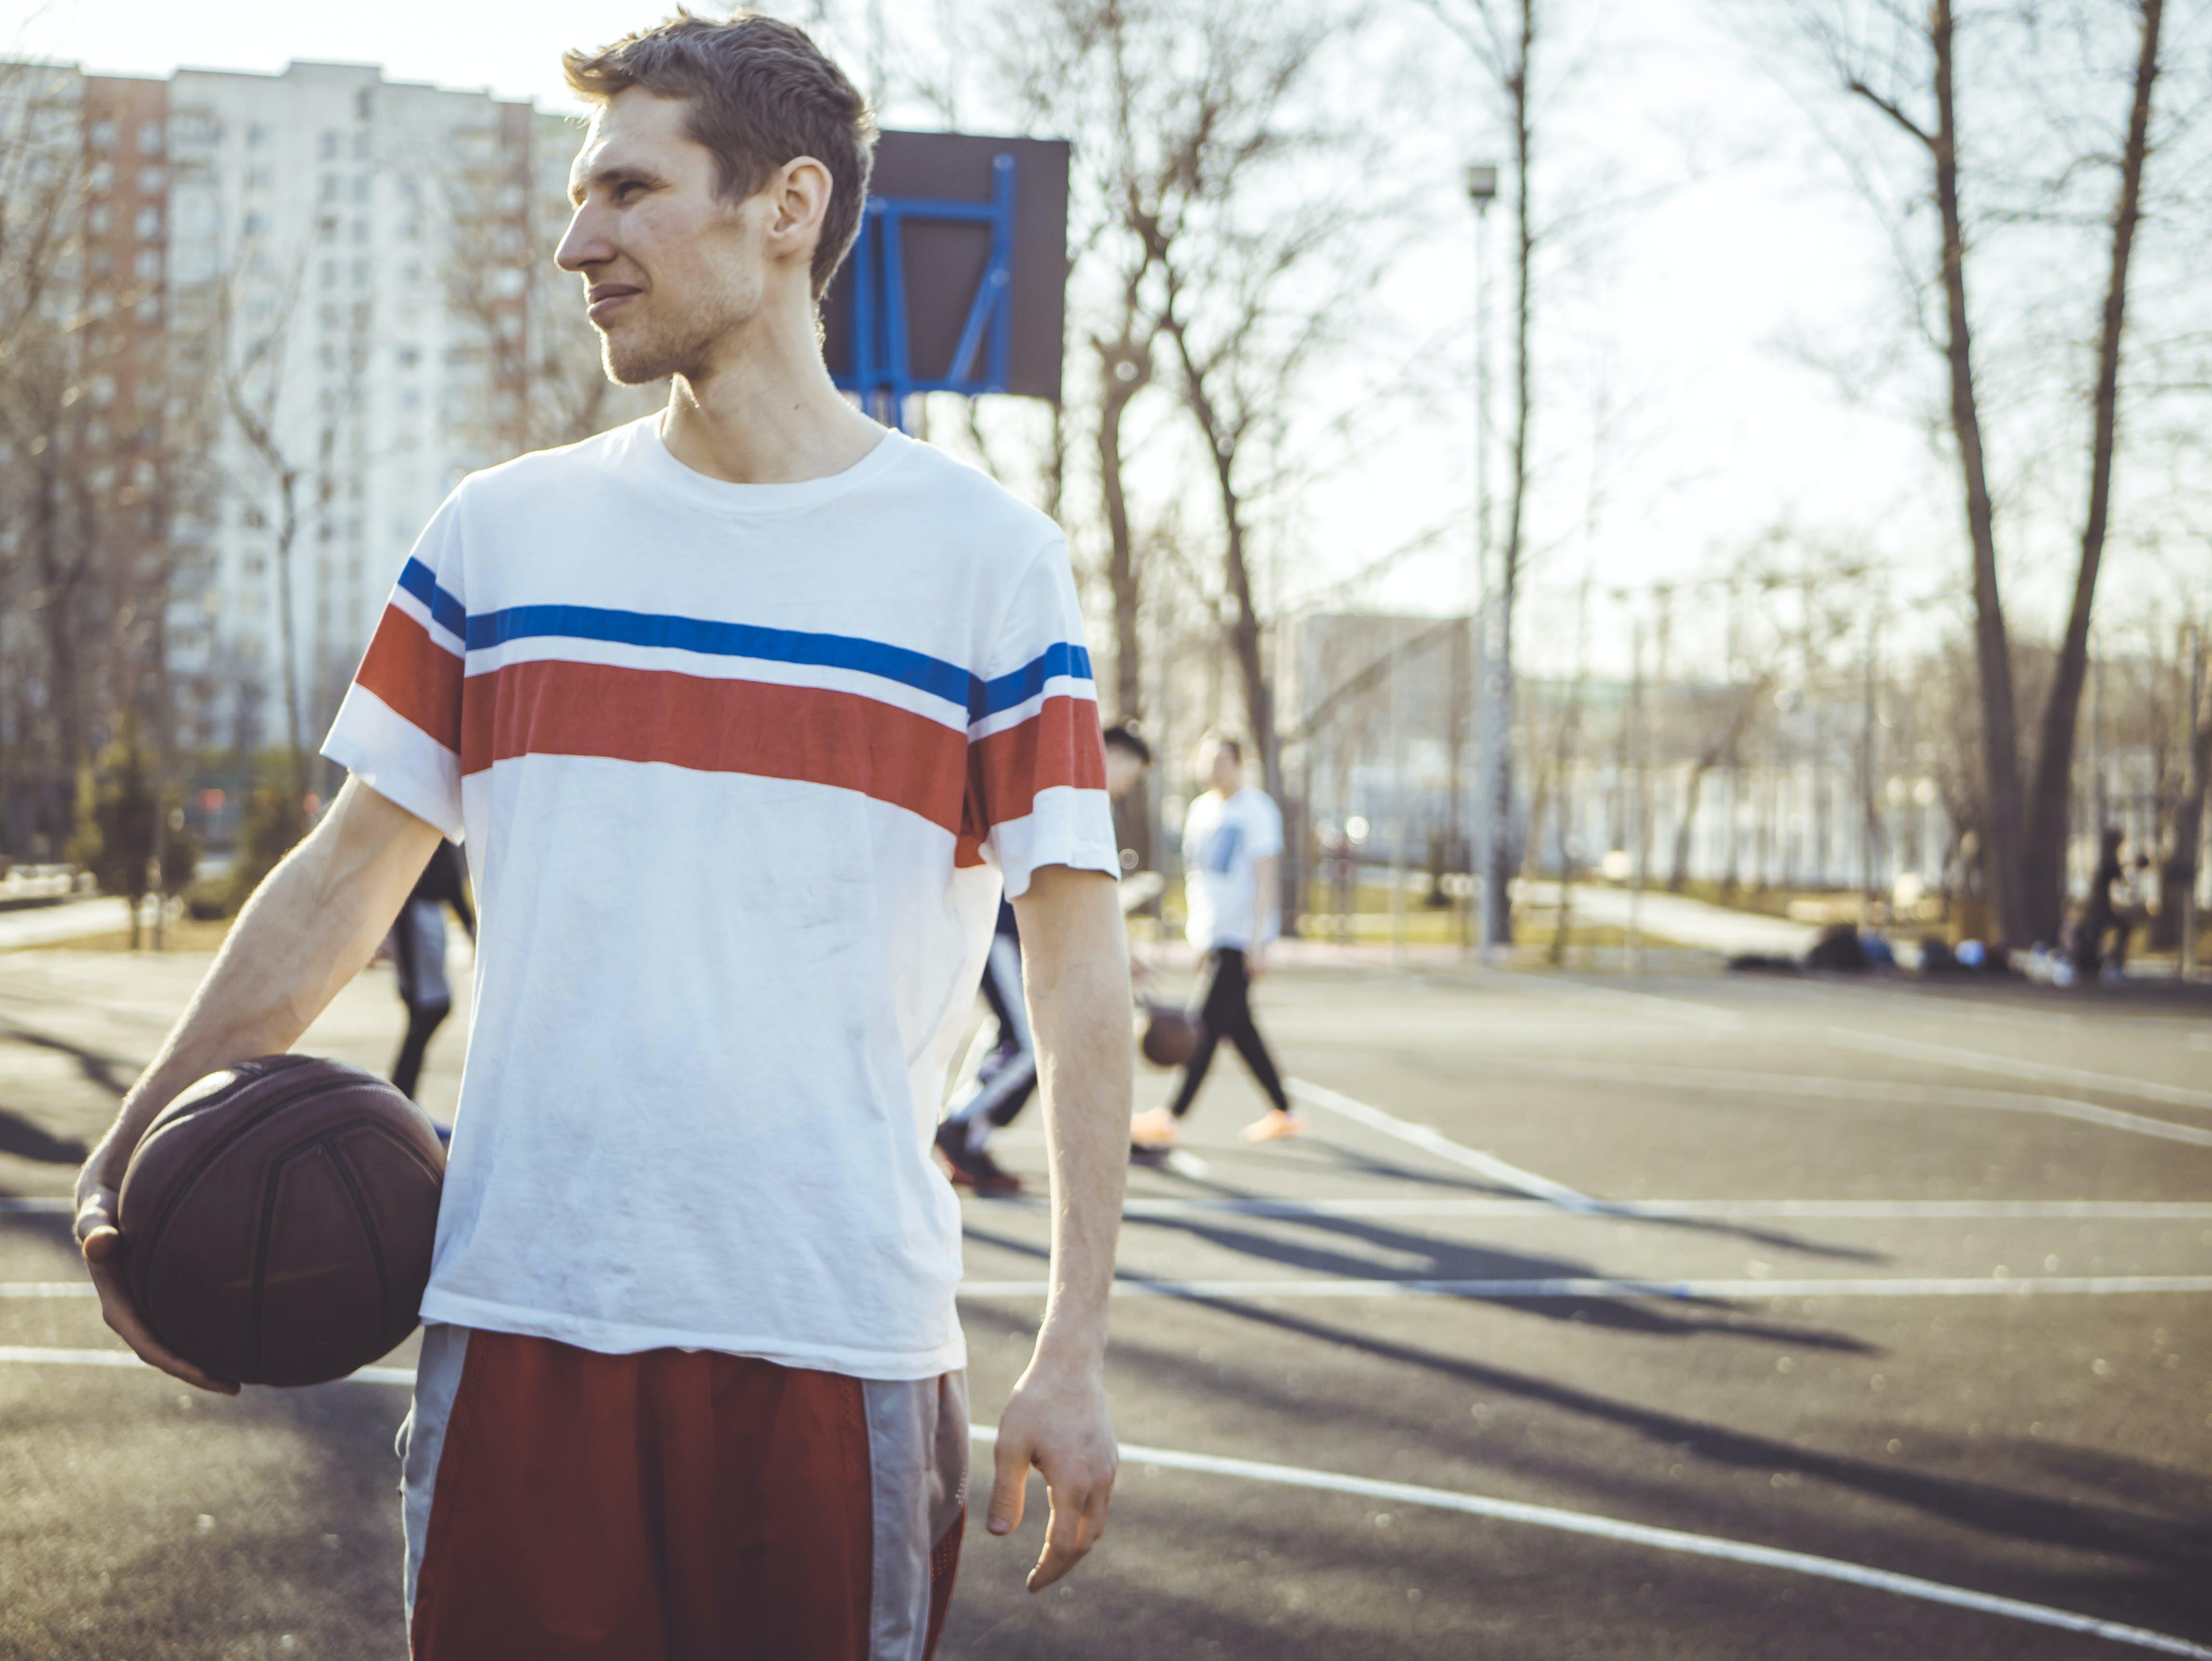 Man Wearing Shirt Holding Basketball in Court